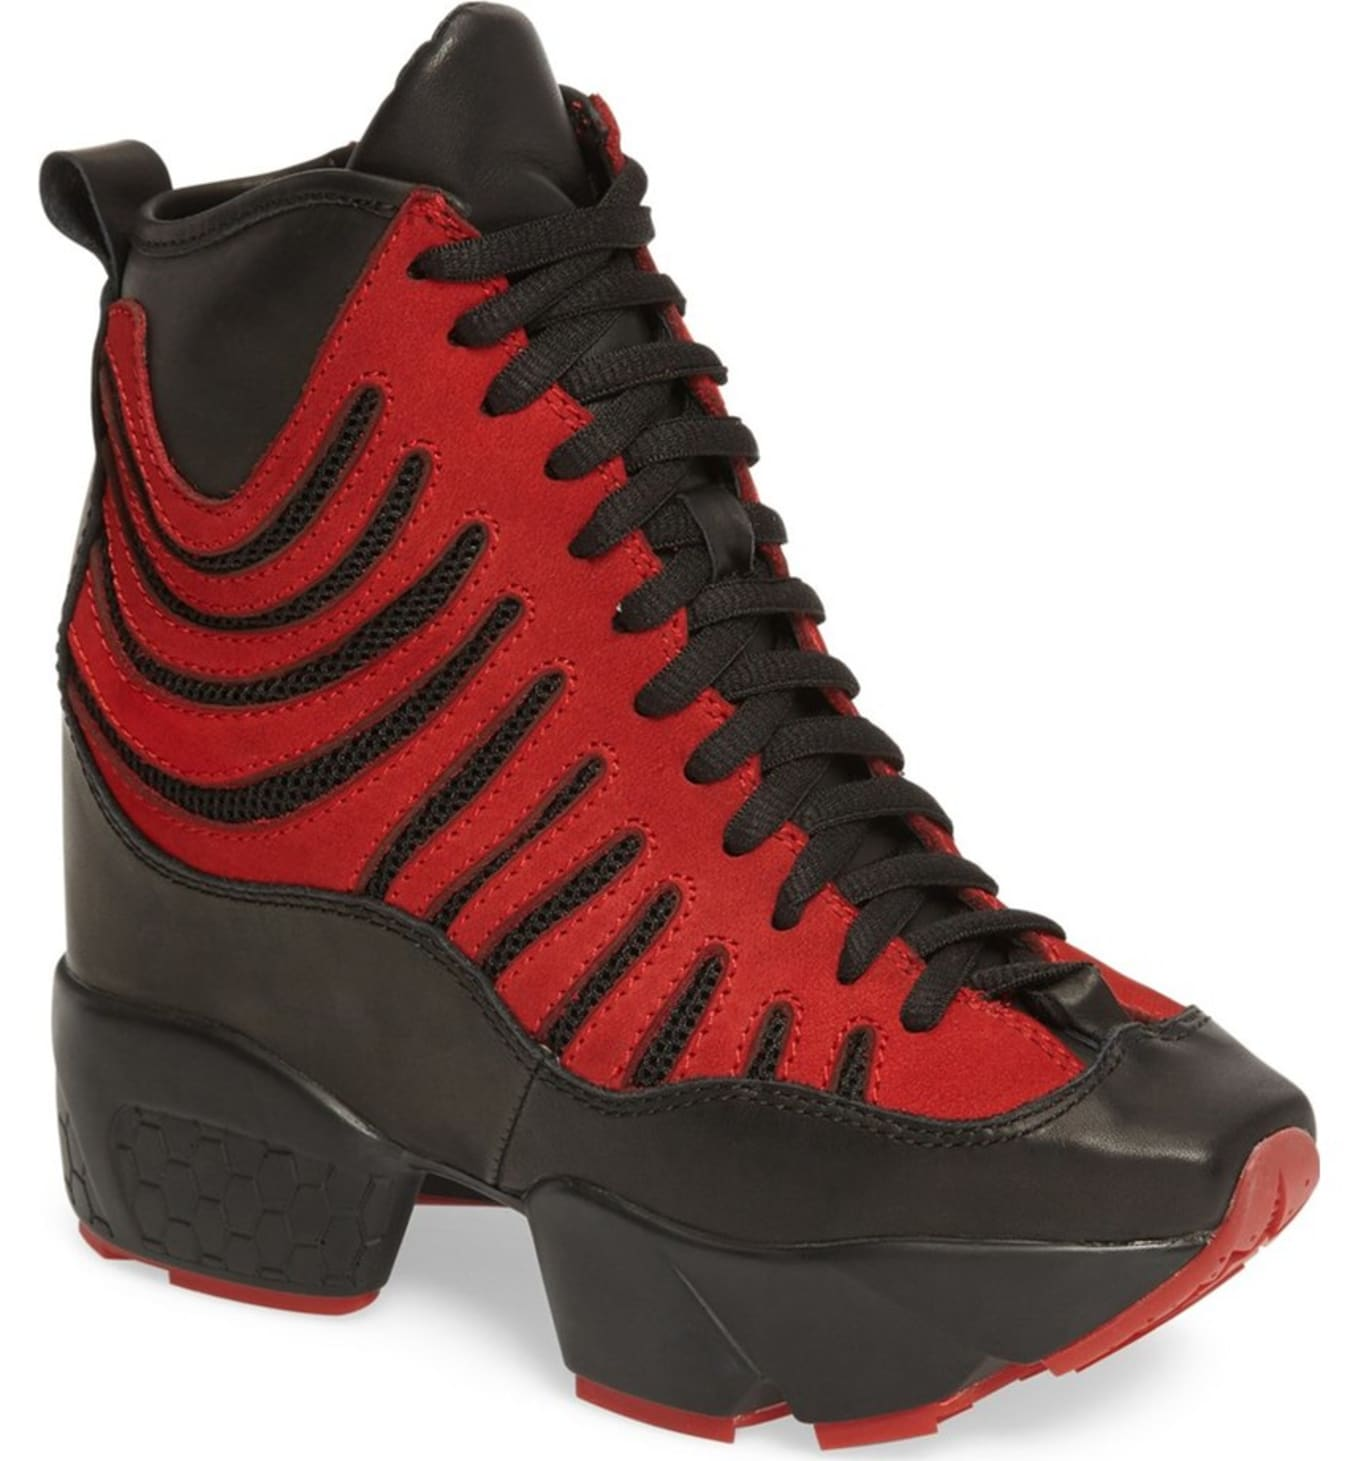 485bdd14dfb4 This Tim Hardaway Nike Rip-Off Is Ridiculous